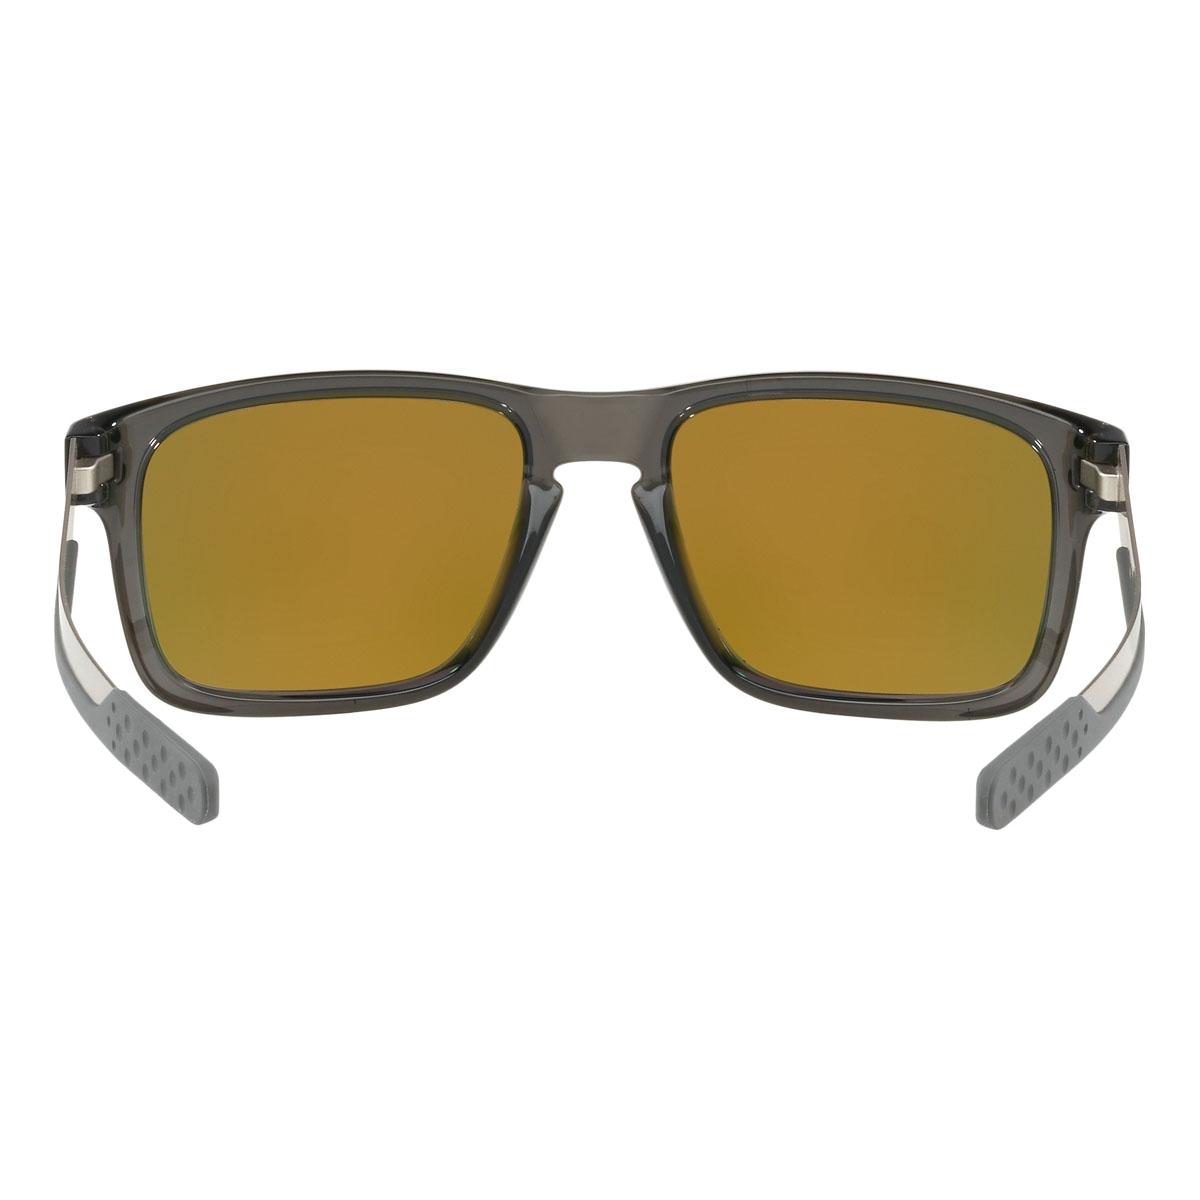 be379317a8 ... Image of Oakley Holbrook Mix Prizm Polarised Sunglasses - Grey Smoke  Frame Prizm Ruby Polarized ...